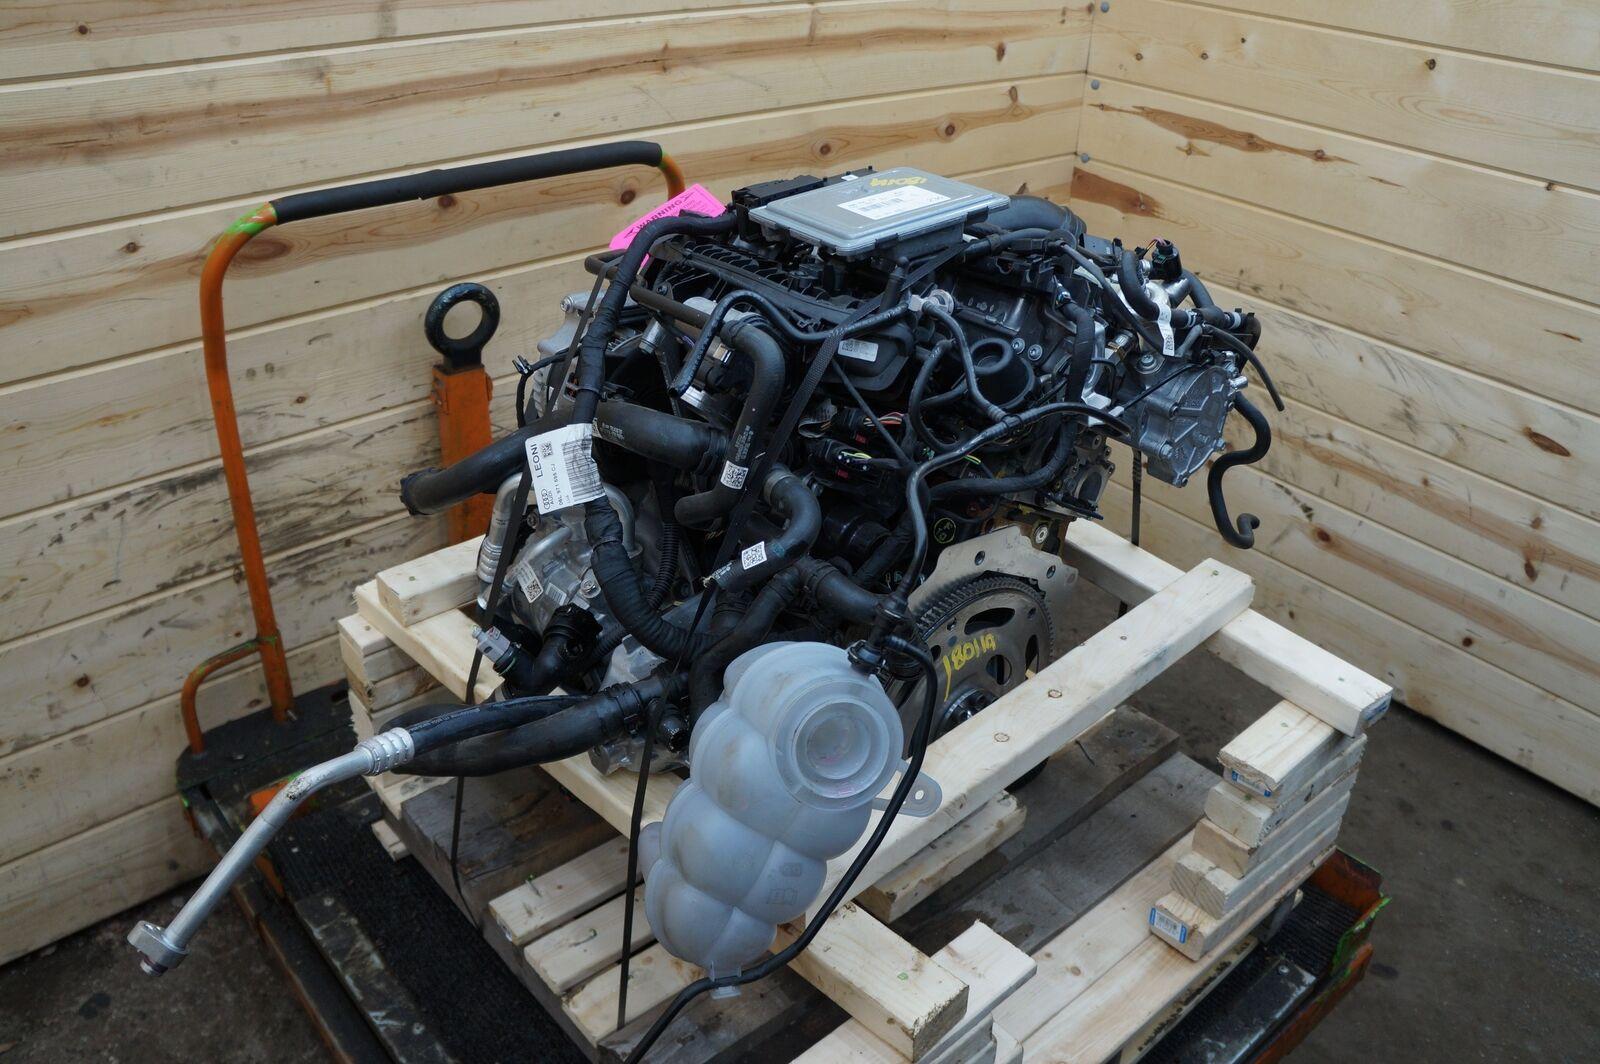 1 8l i4 turbo cymc engine dropout assembly audi a4 b9. Black Bedroom Furniture Sets. Home Design Ideas